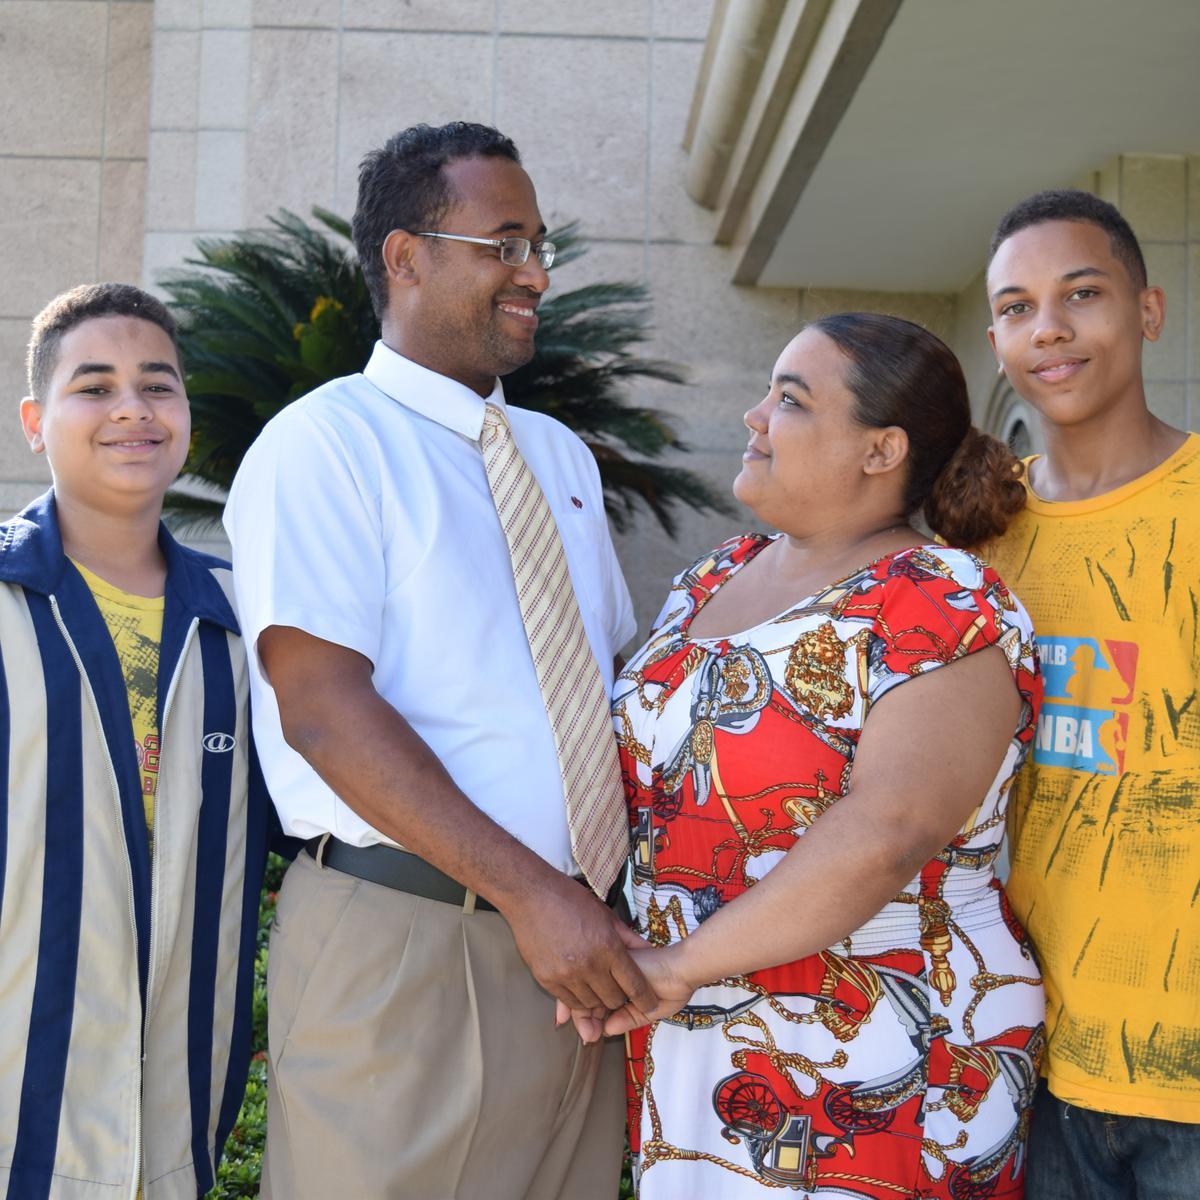 Familia Gautraux Diaz